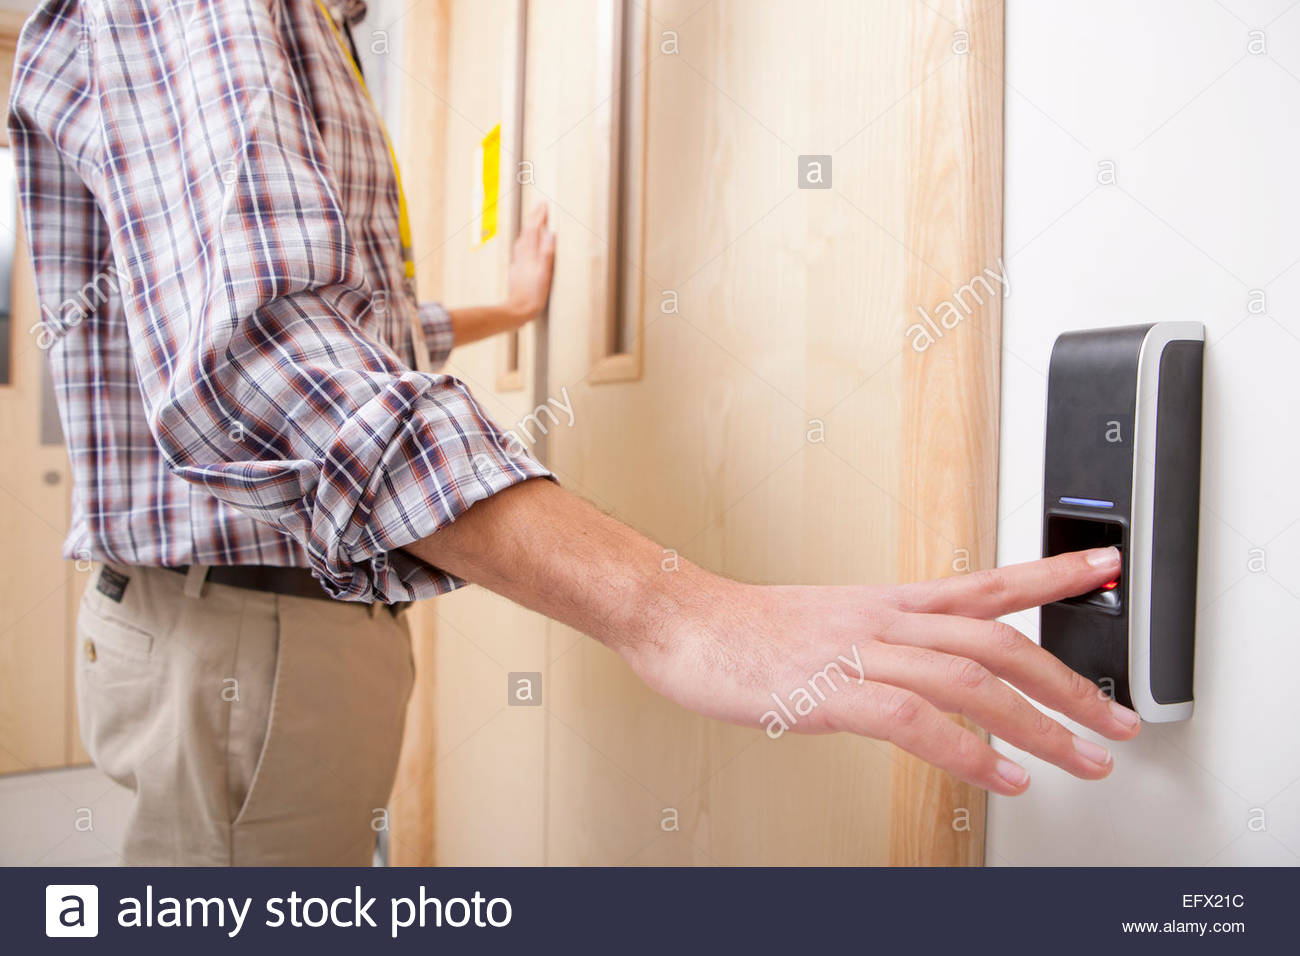 Mann mit Finger print Technologie Tür öffnen Stockbild